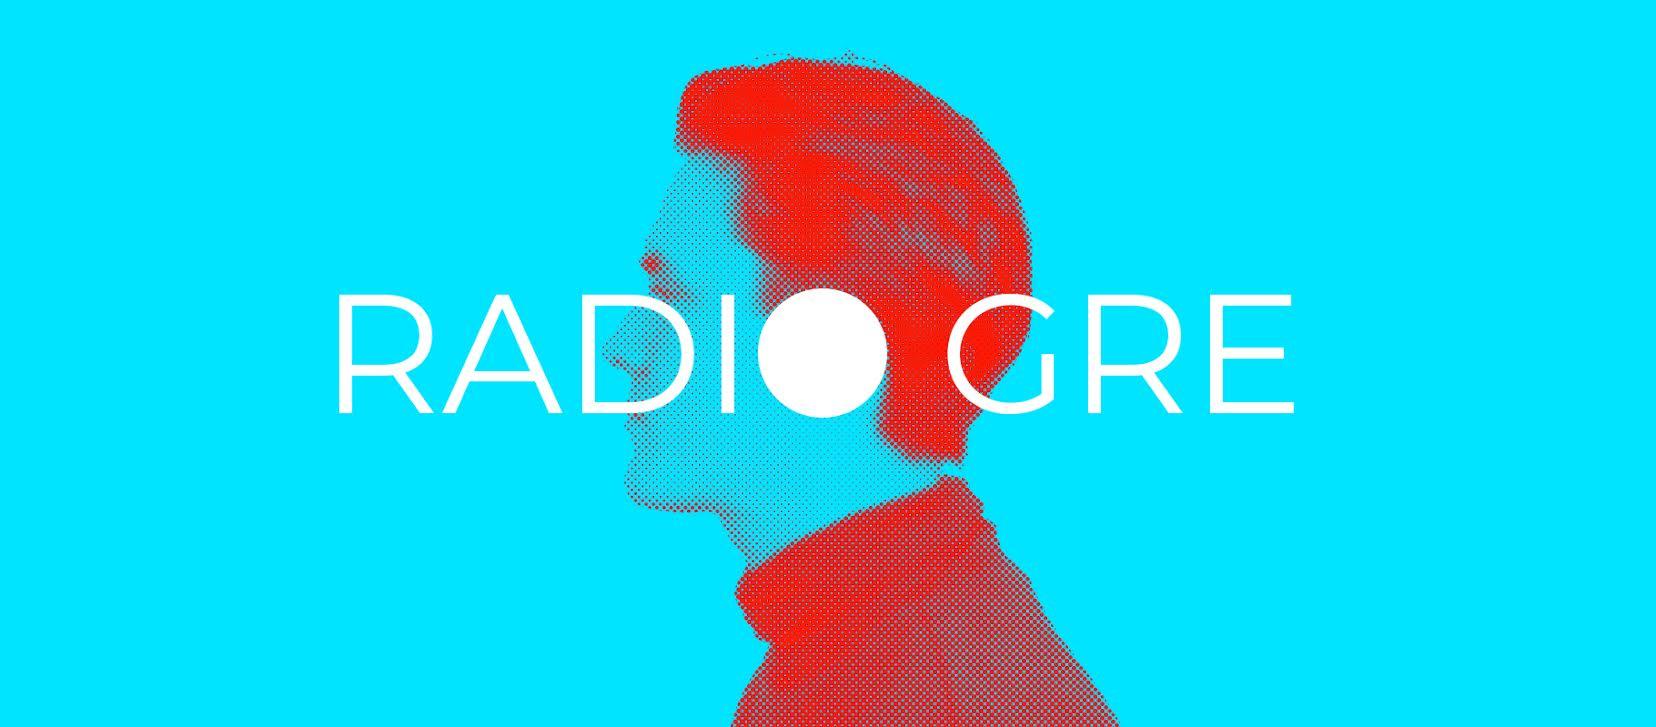 Radio GRE